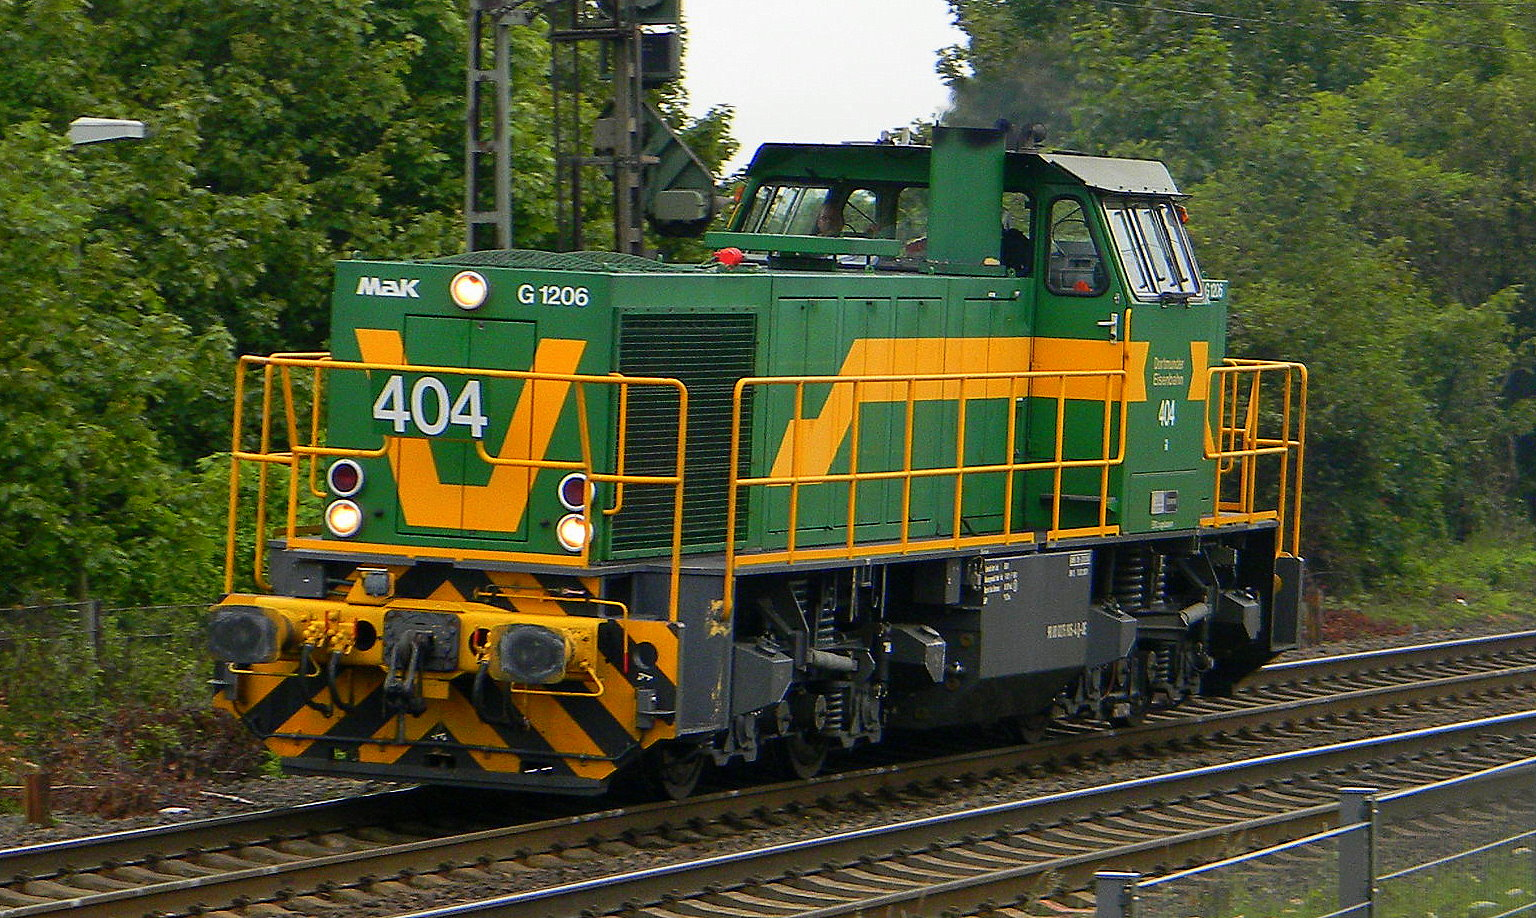 Dortmunder Eisenbahn 404